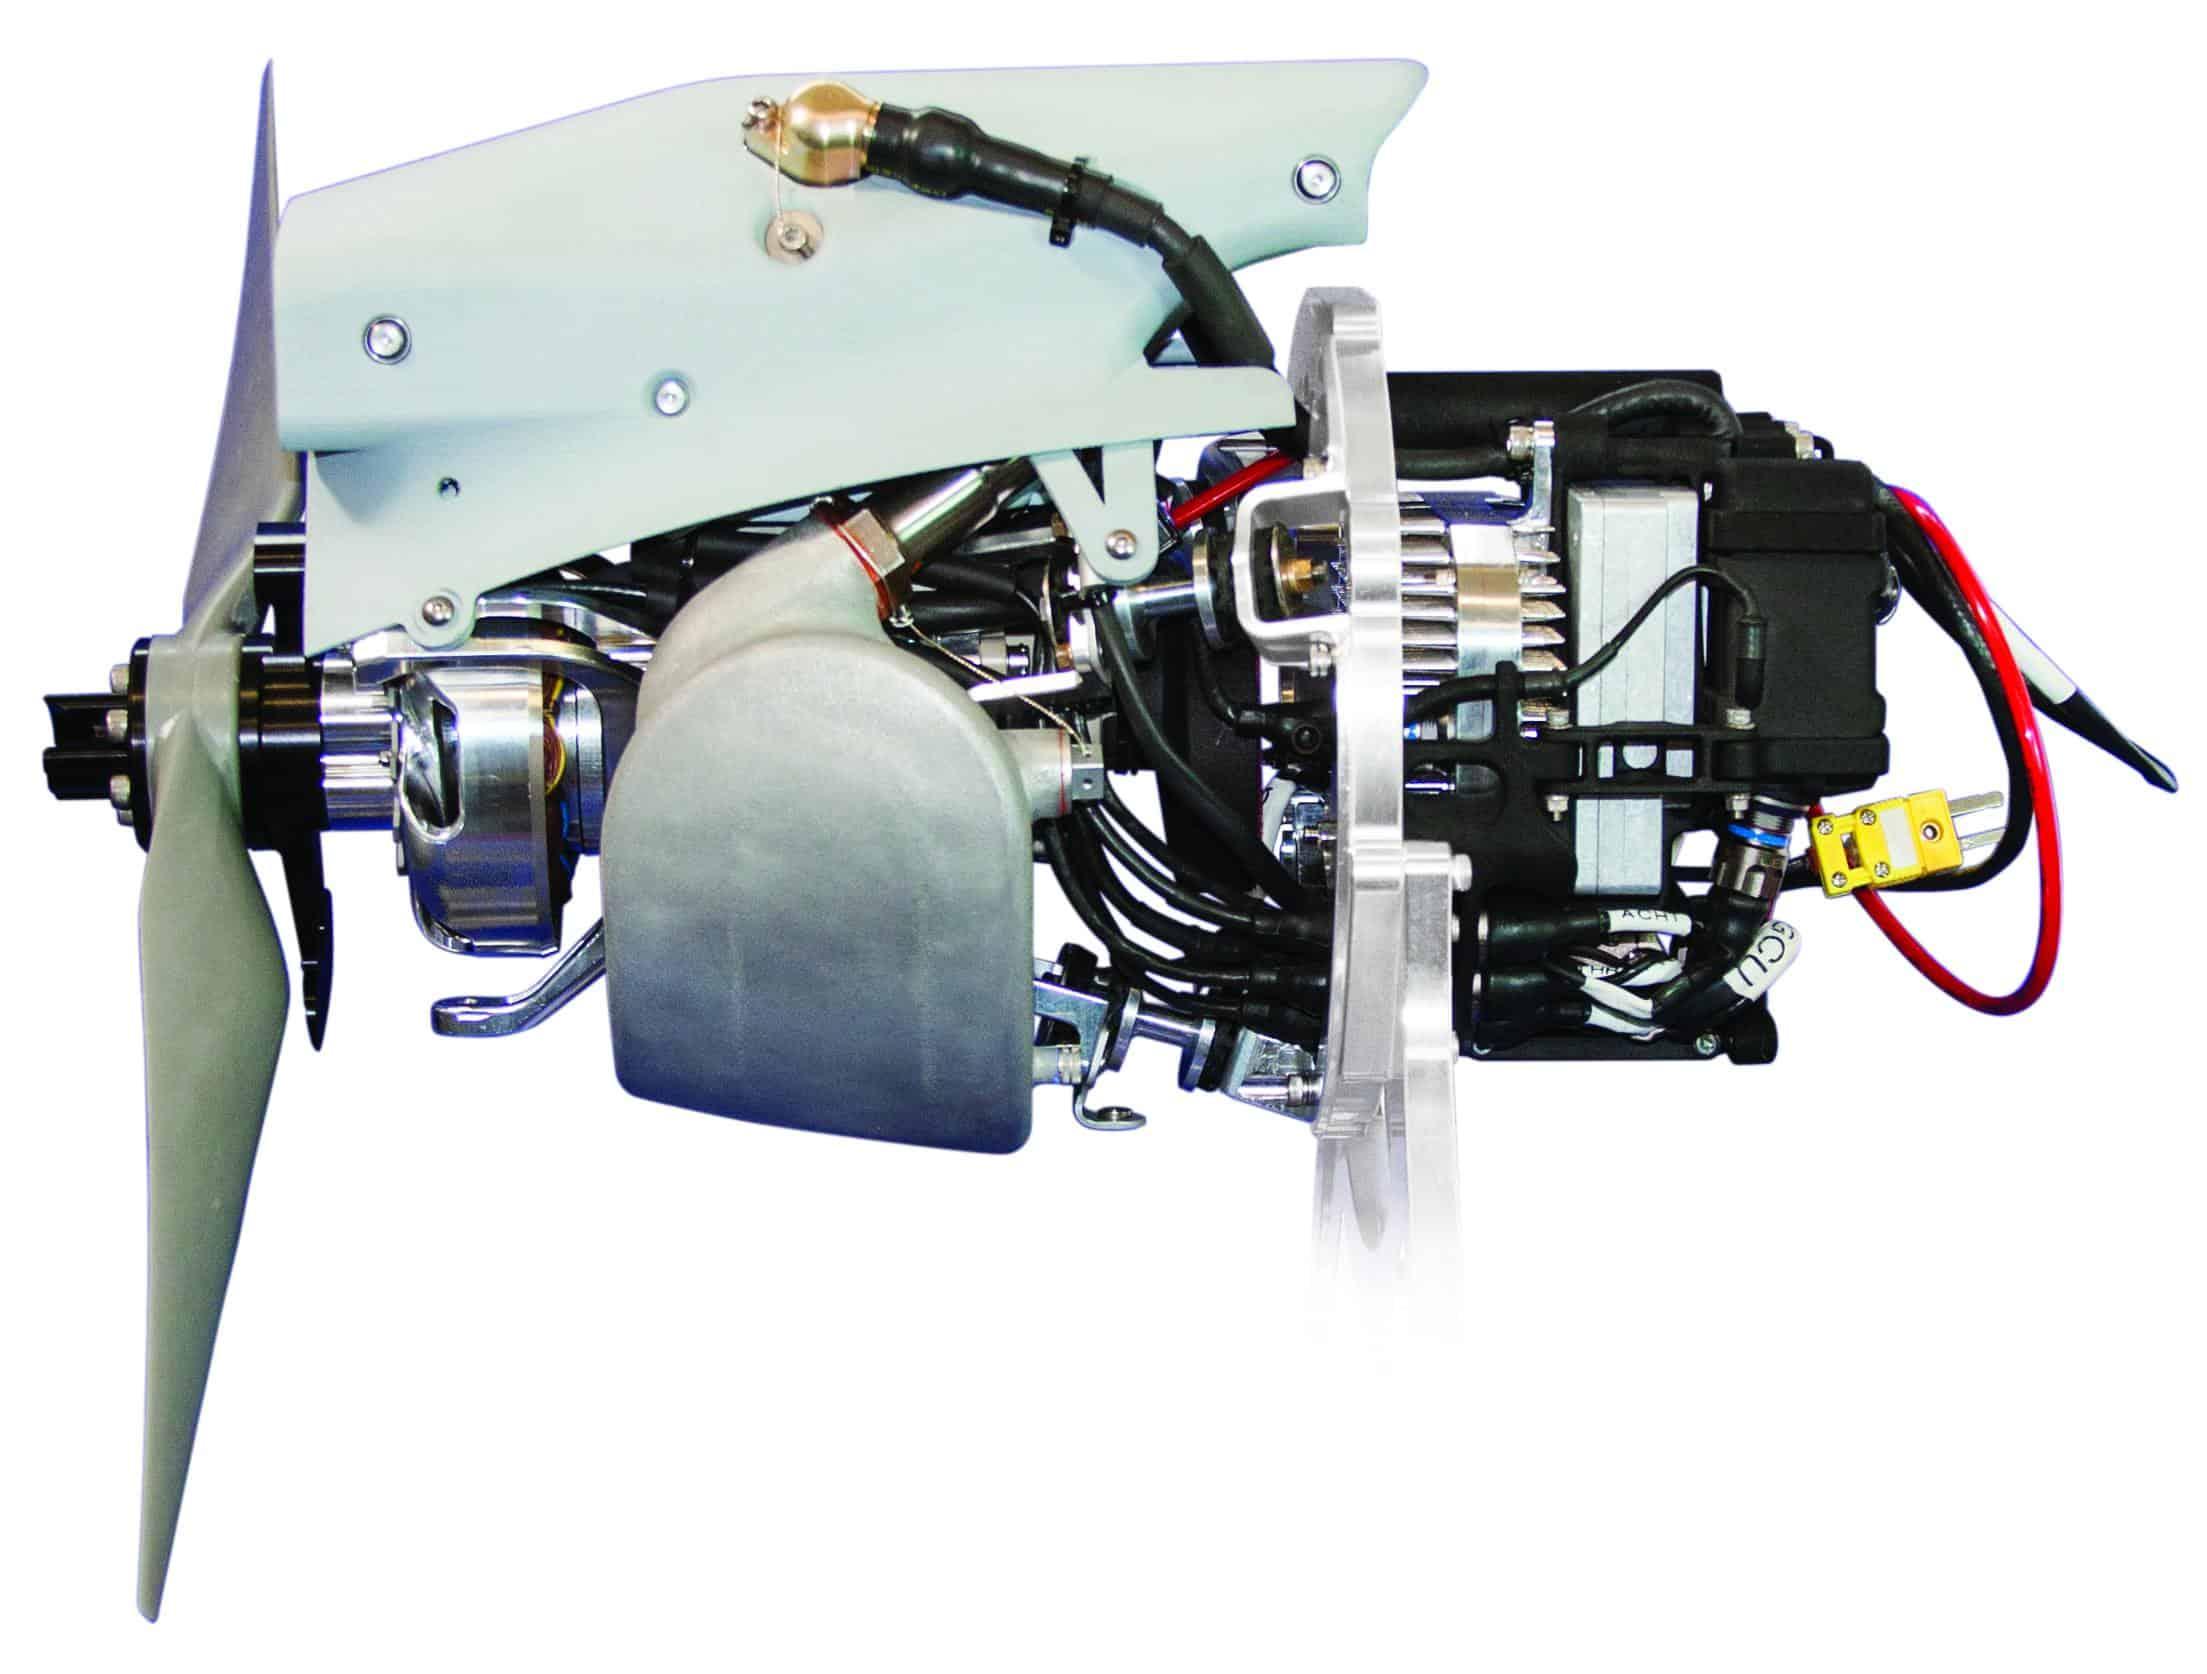 NWUAV NW-44 UAV propulsion system